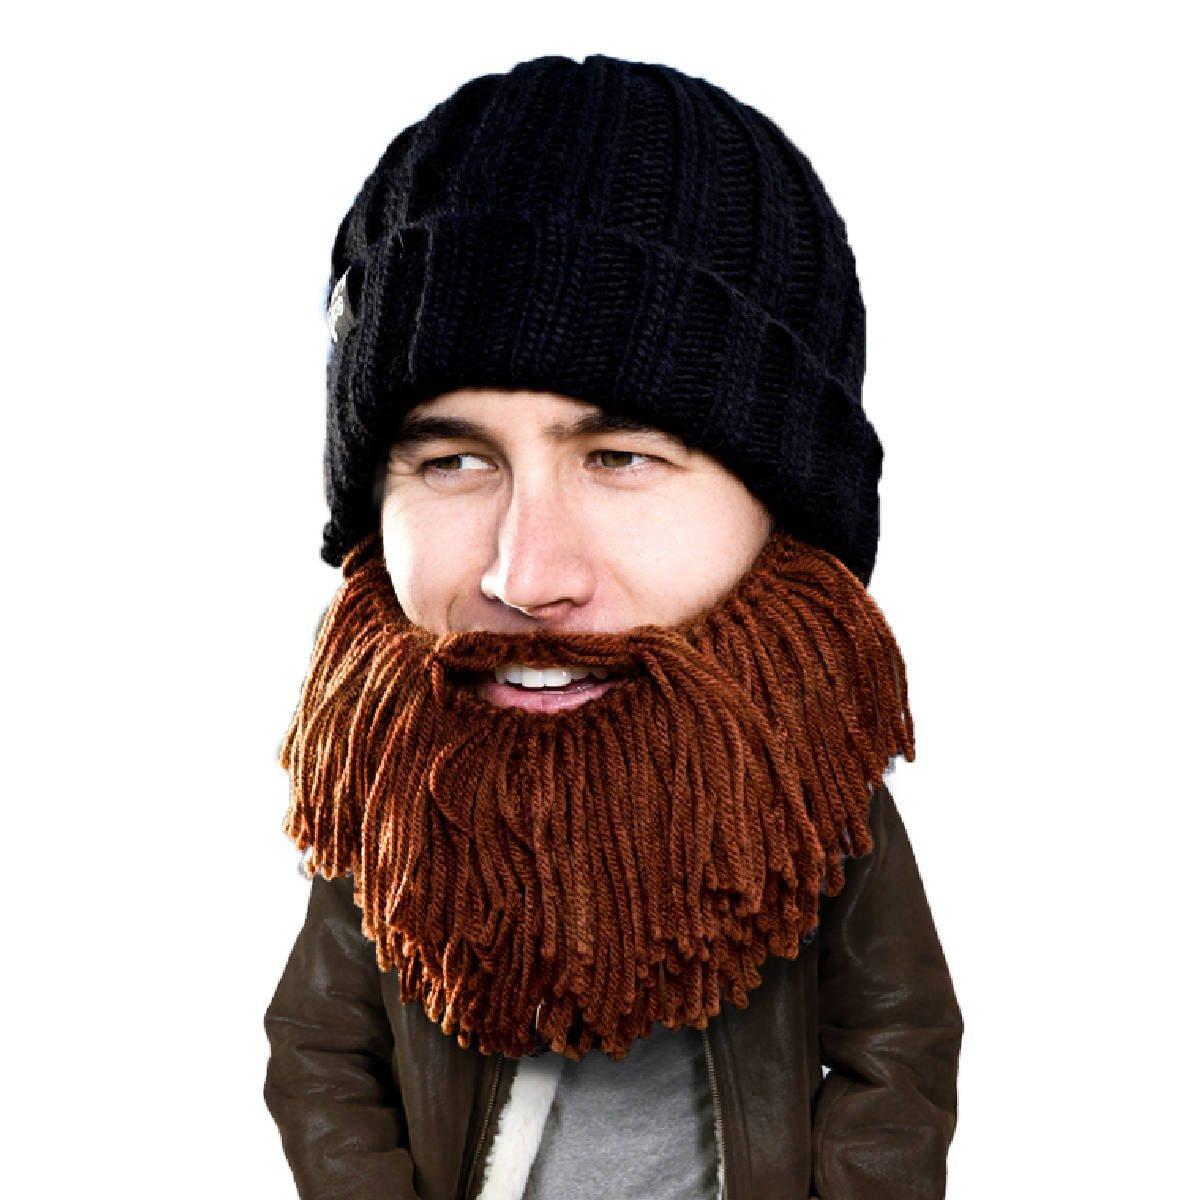 Beard Head Barbarian Vagabond Beanie - Funny Knit Hat and Fake Beard Facemask